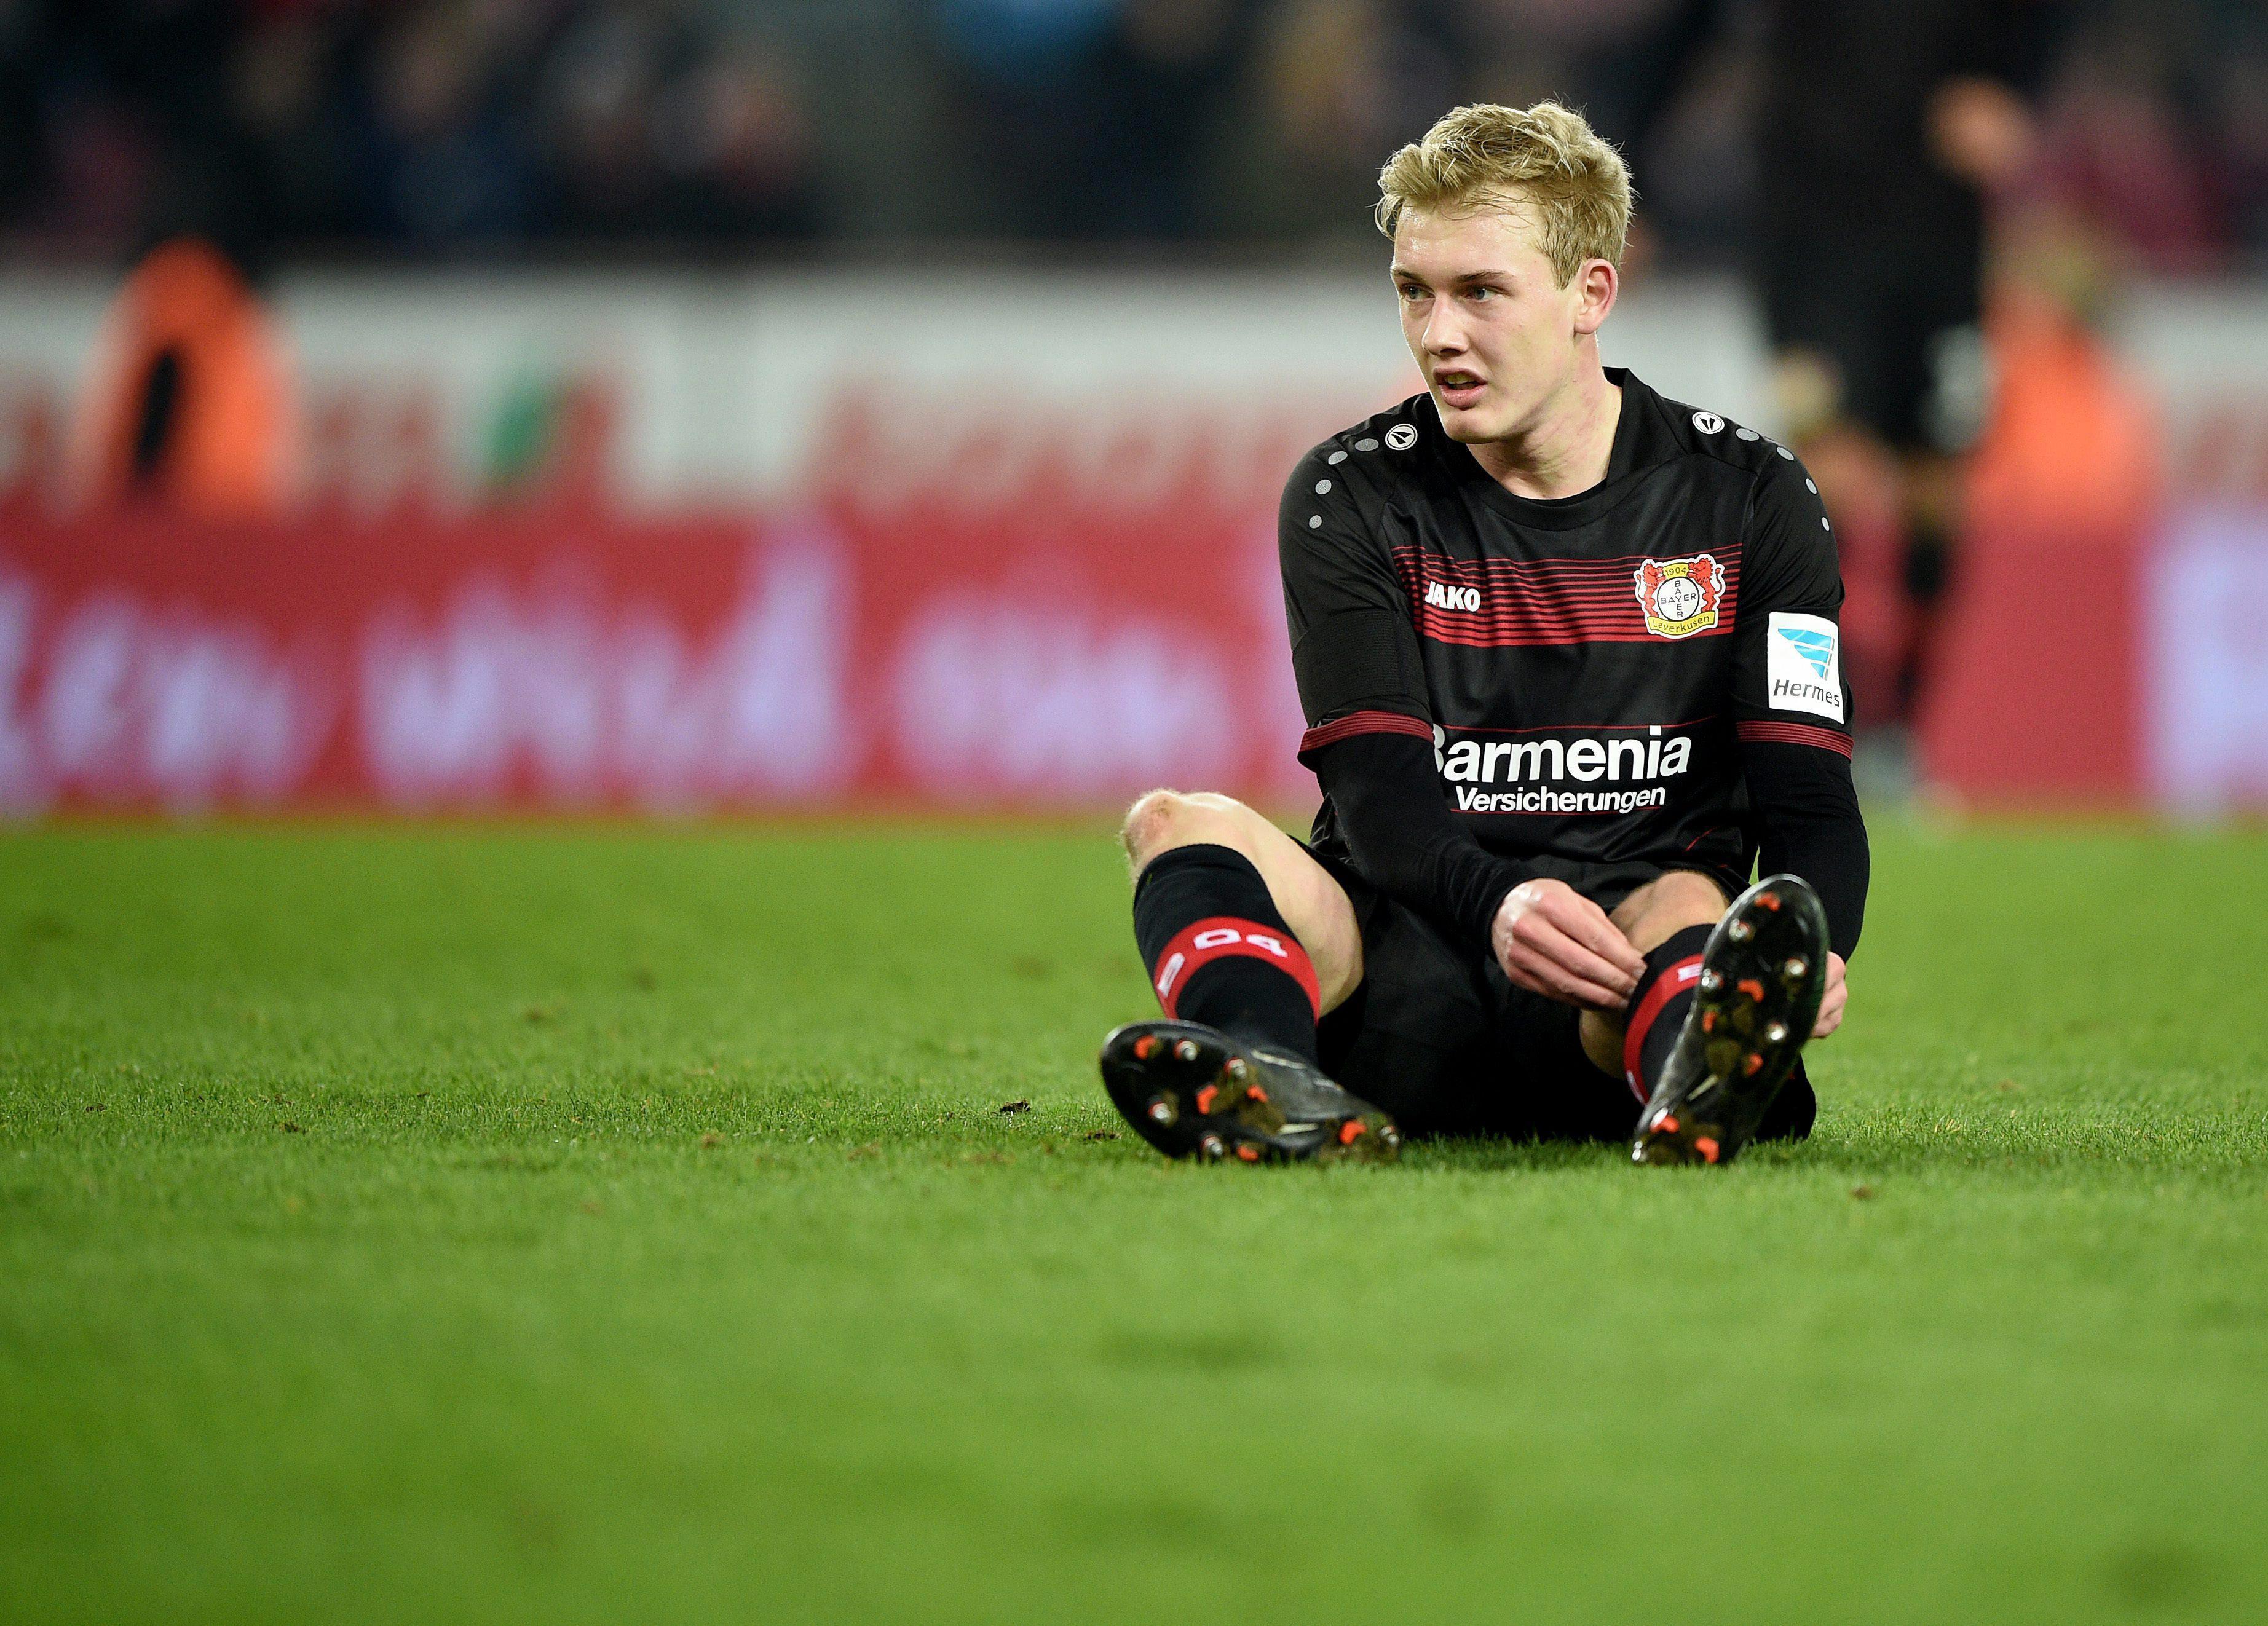 Brandt wants to be playing regular football next season for Bayer Leverkusen